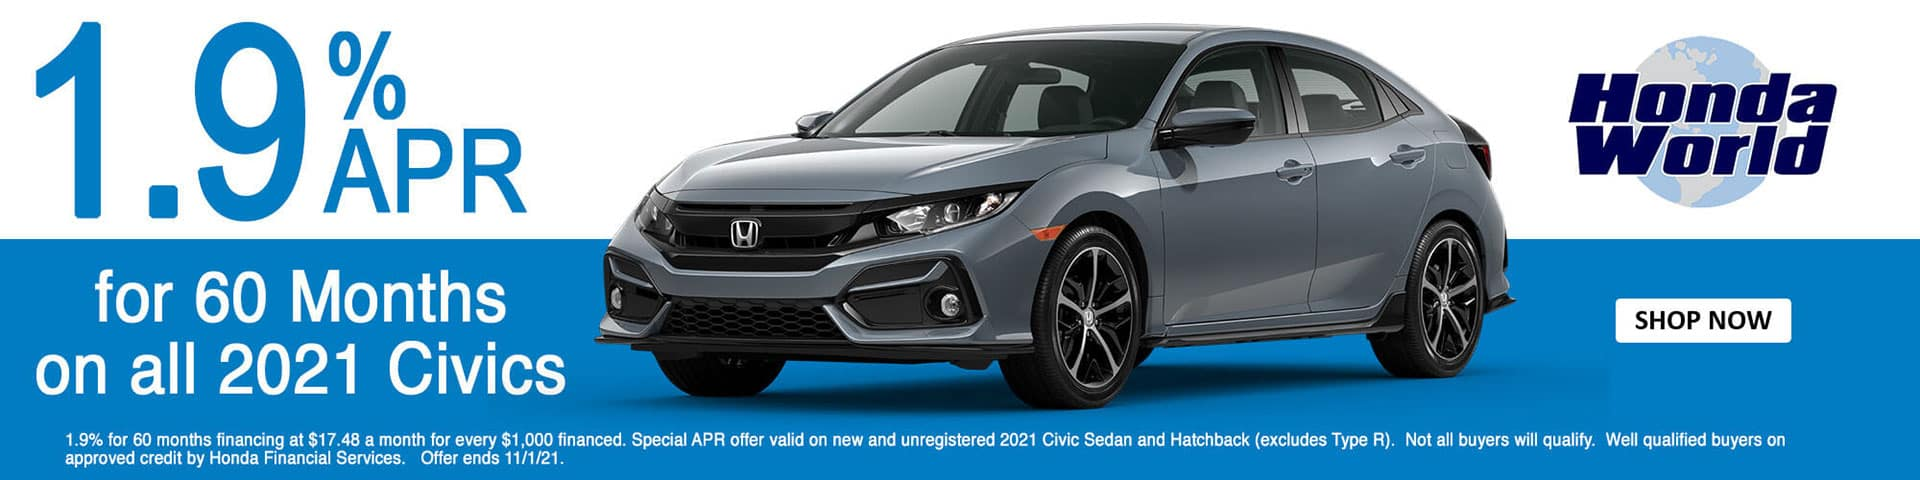 2021 Honda Civic APR Offer